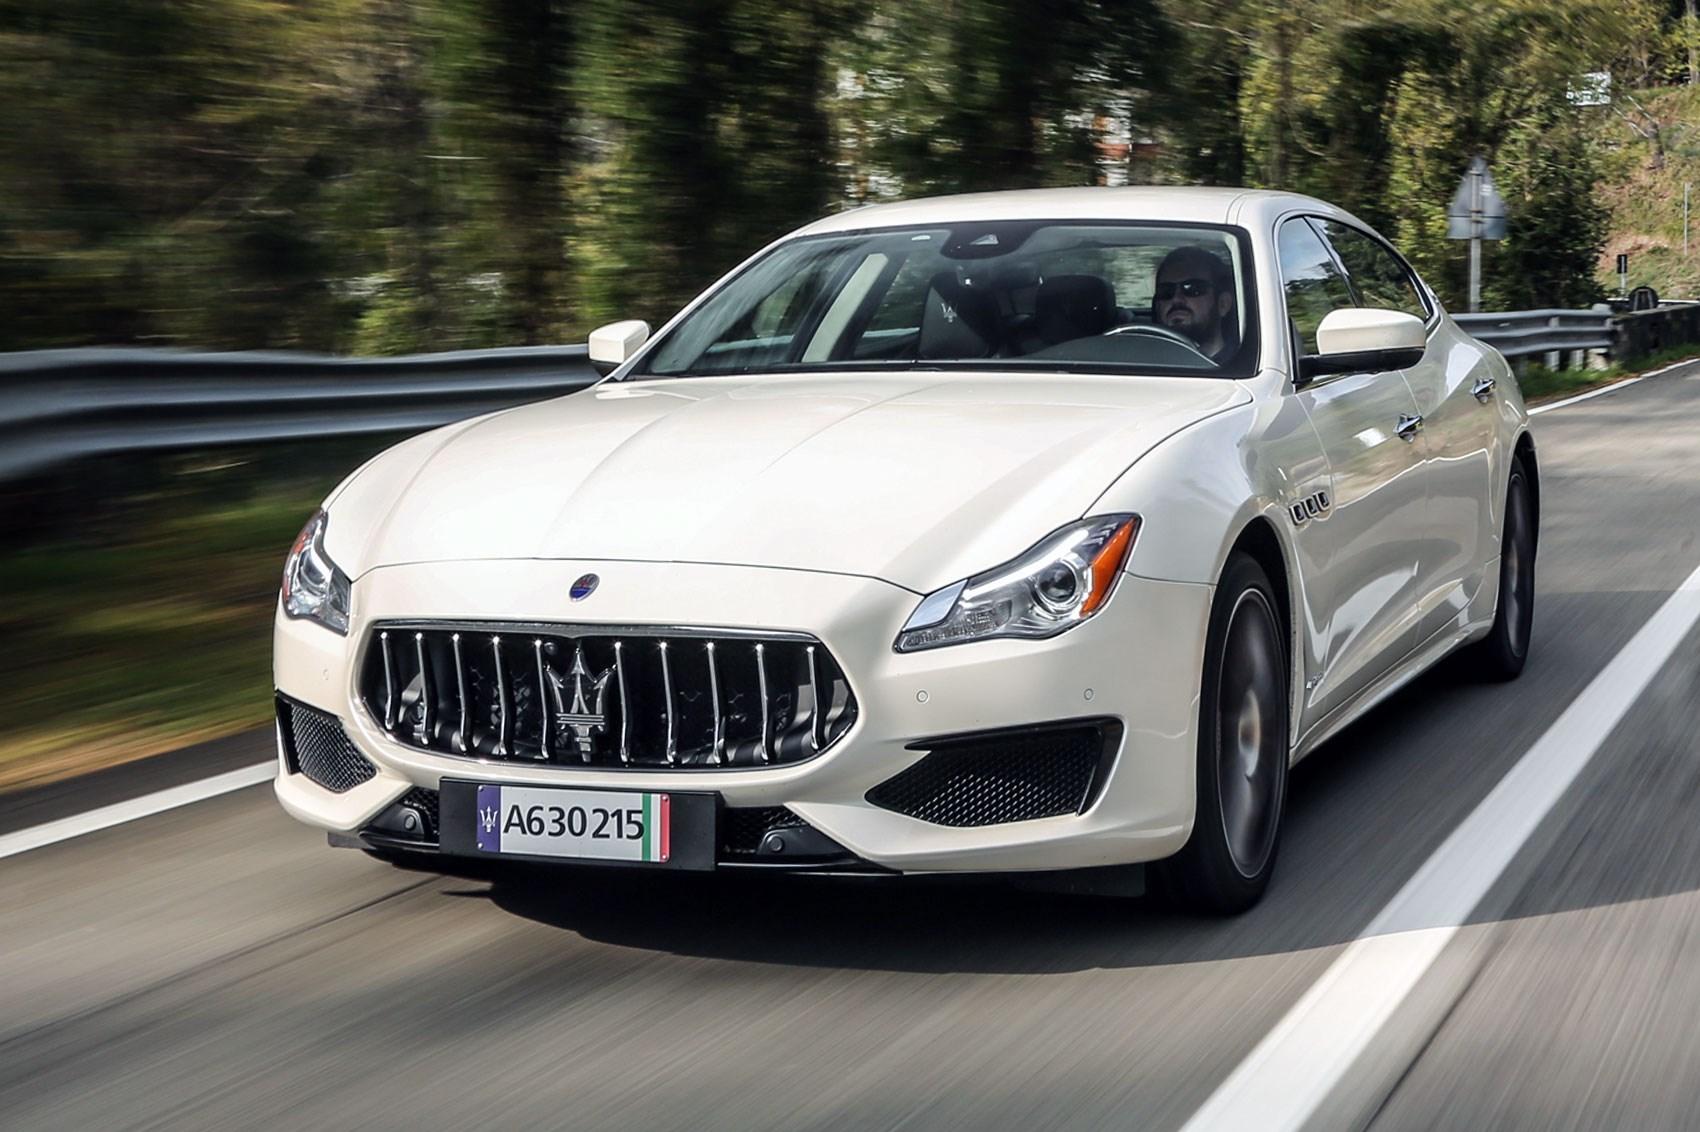 Chevrolet Lease Deals >> Maserati Quattroporte GTS (2016) review by CAR Magazine